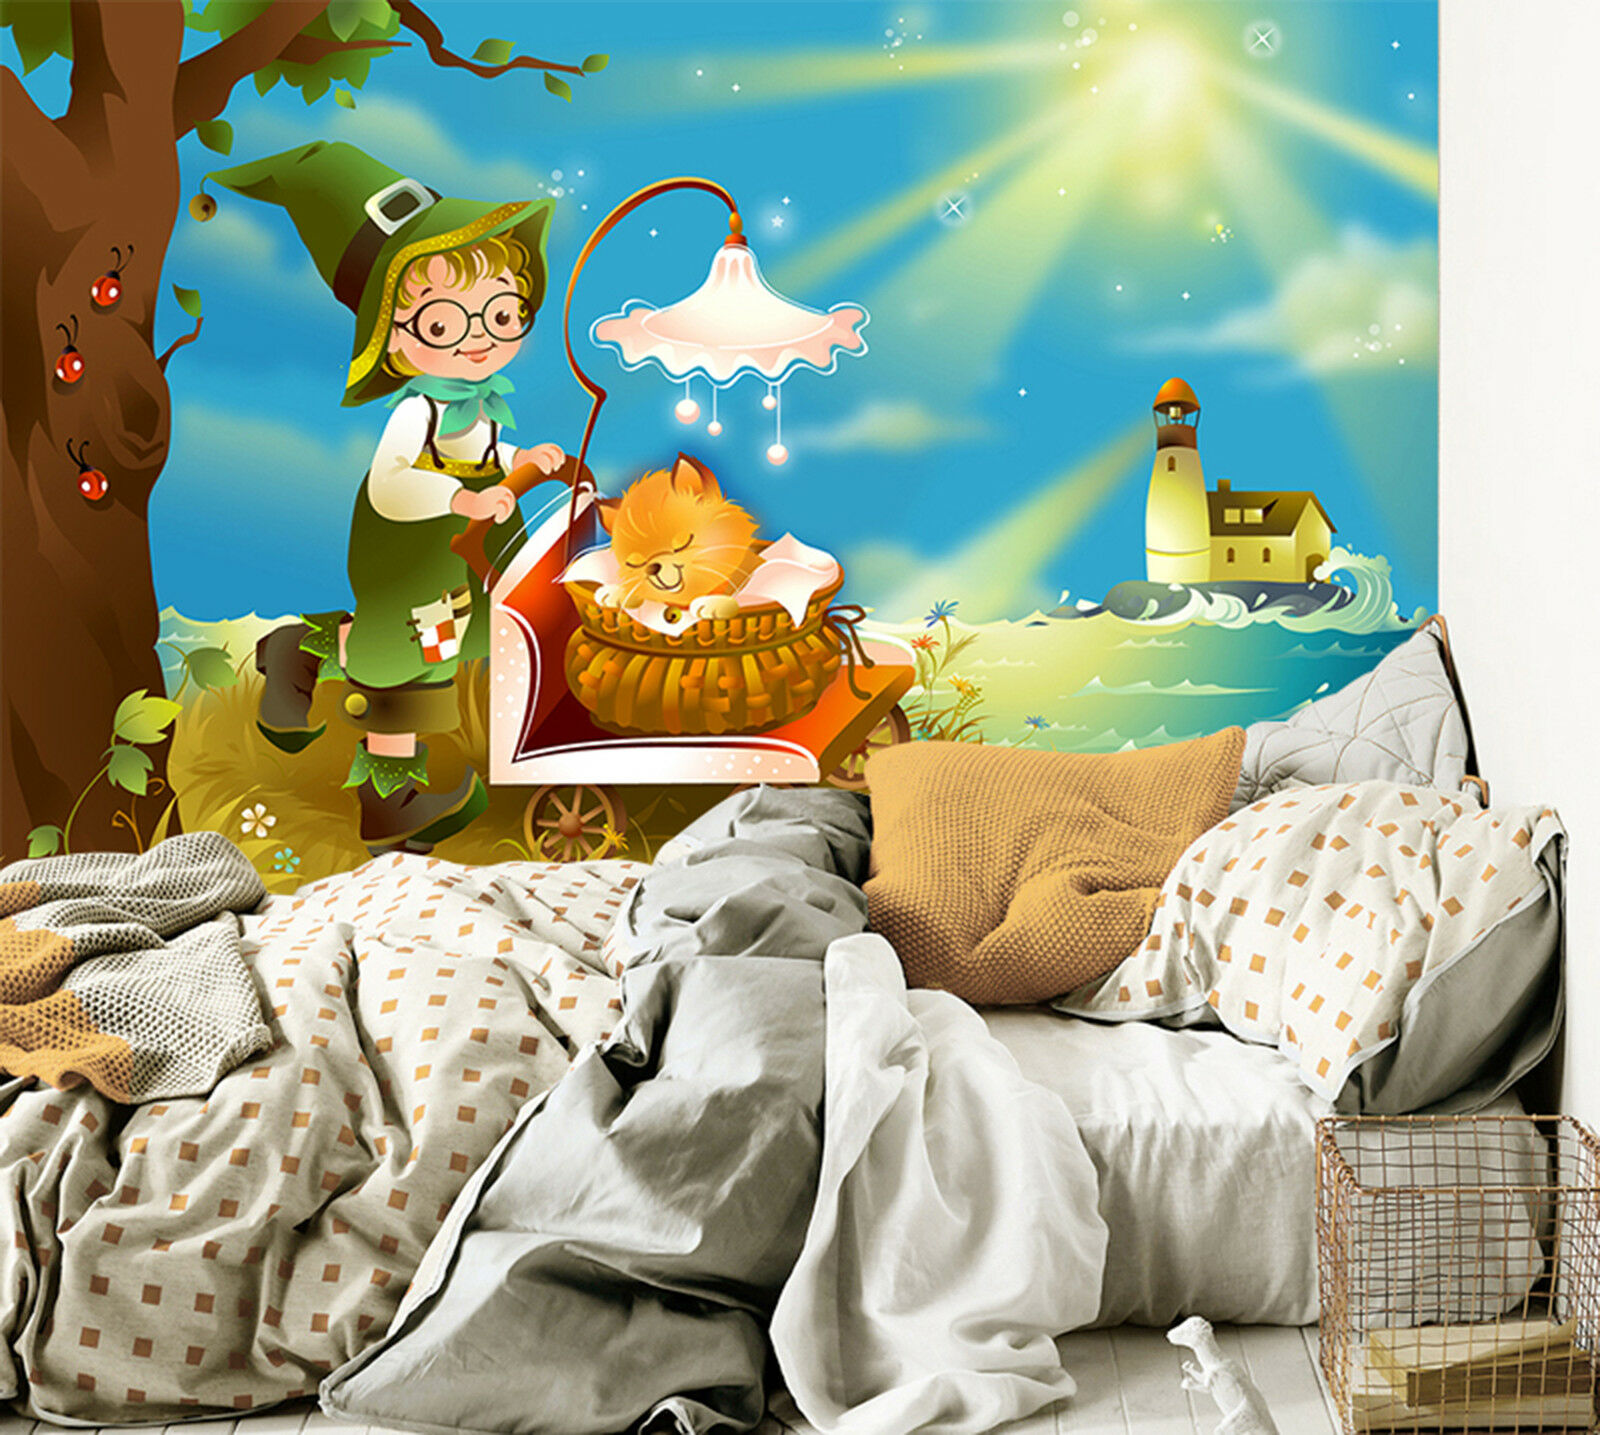 3D Licht Bäume Fototapeten Wandbild Fototapete Bild Tapete Familie Kinder